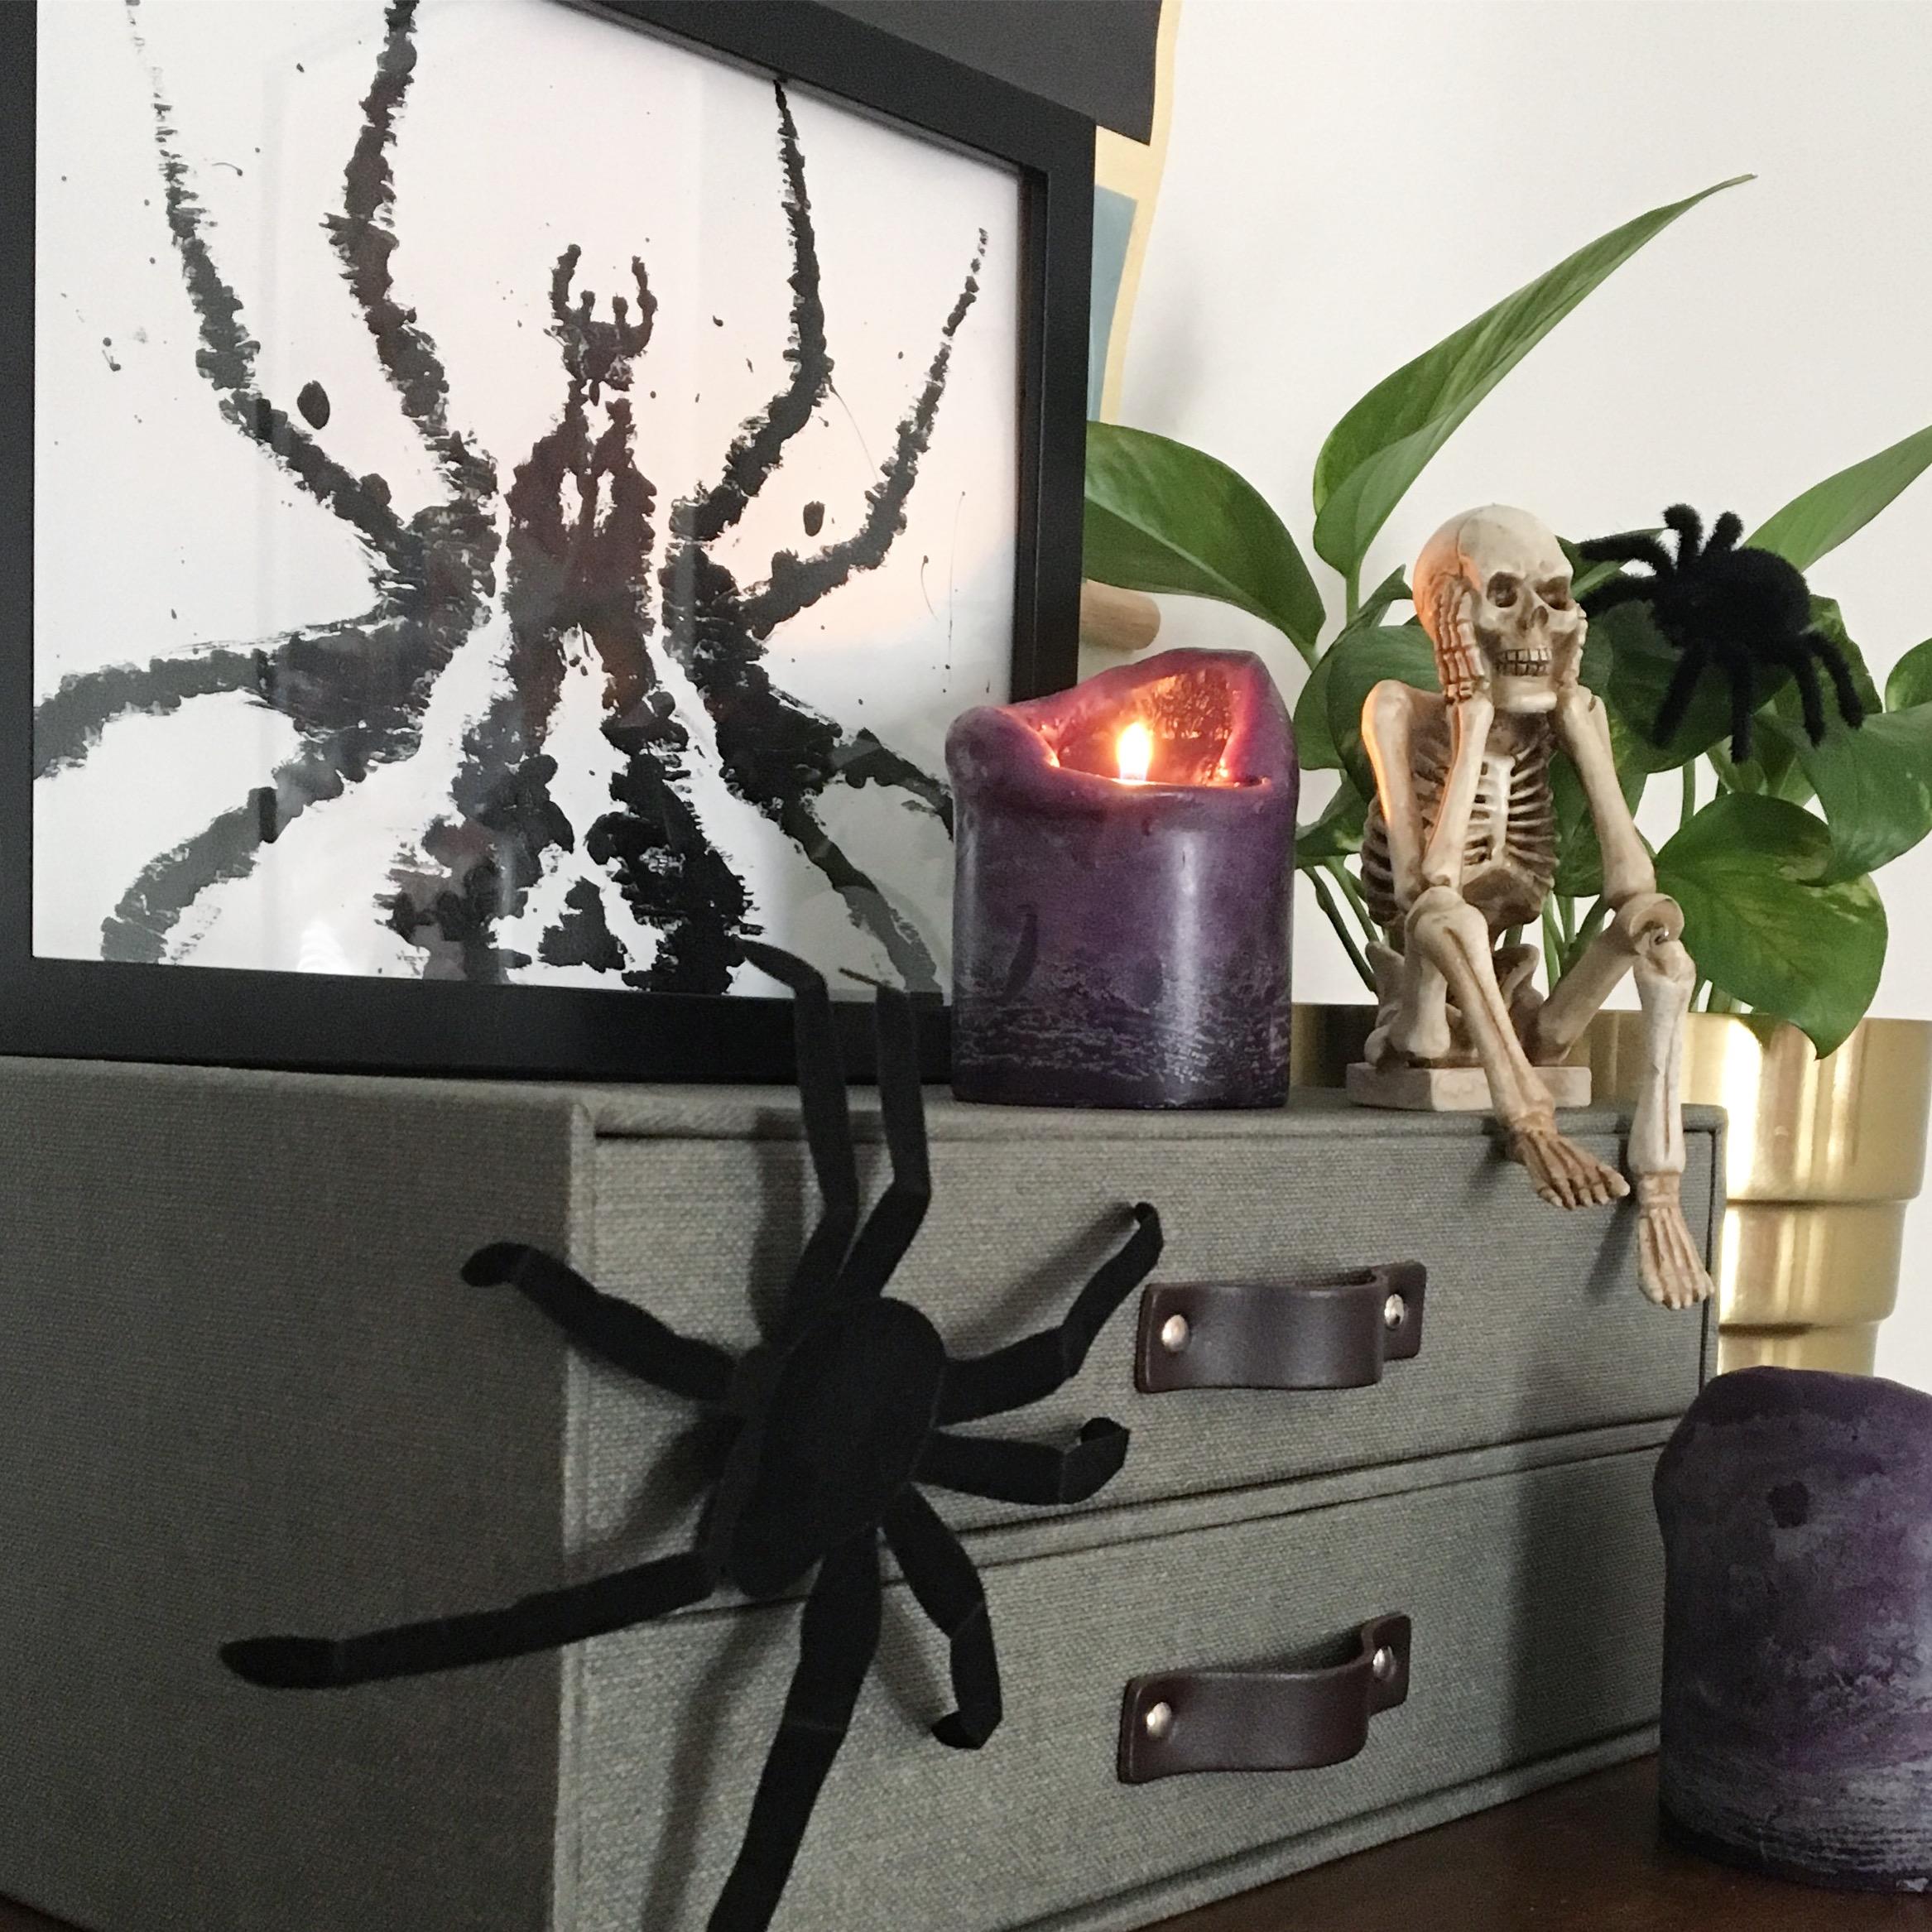 Easy Inkblot Wall Art for Halloween  #easyhalloween #dollarstore #halloween #halloweendiy #halloweendecor #halloweendecorations #wallart #inkblot #hauntedhouse #haunted #spooky #spookyseason #spookydecor #creepy #diyhalloween #diyhalloweendecorations